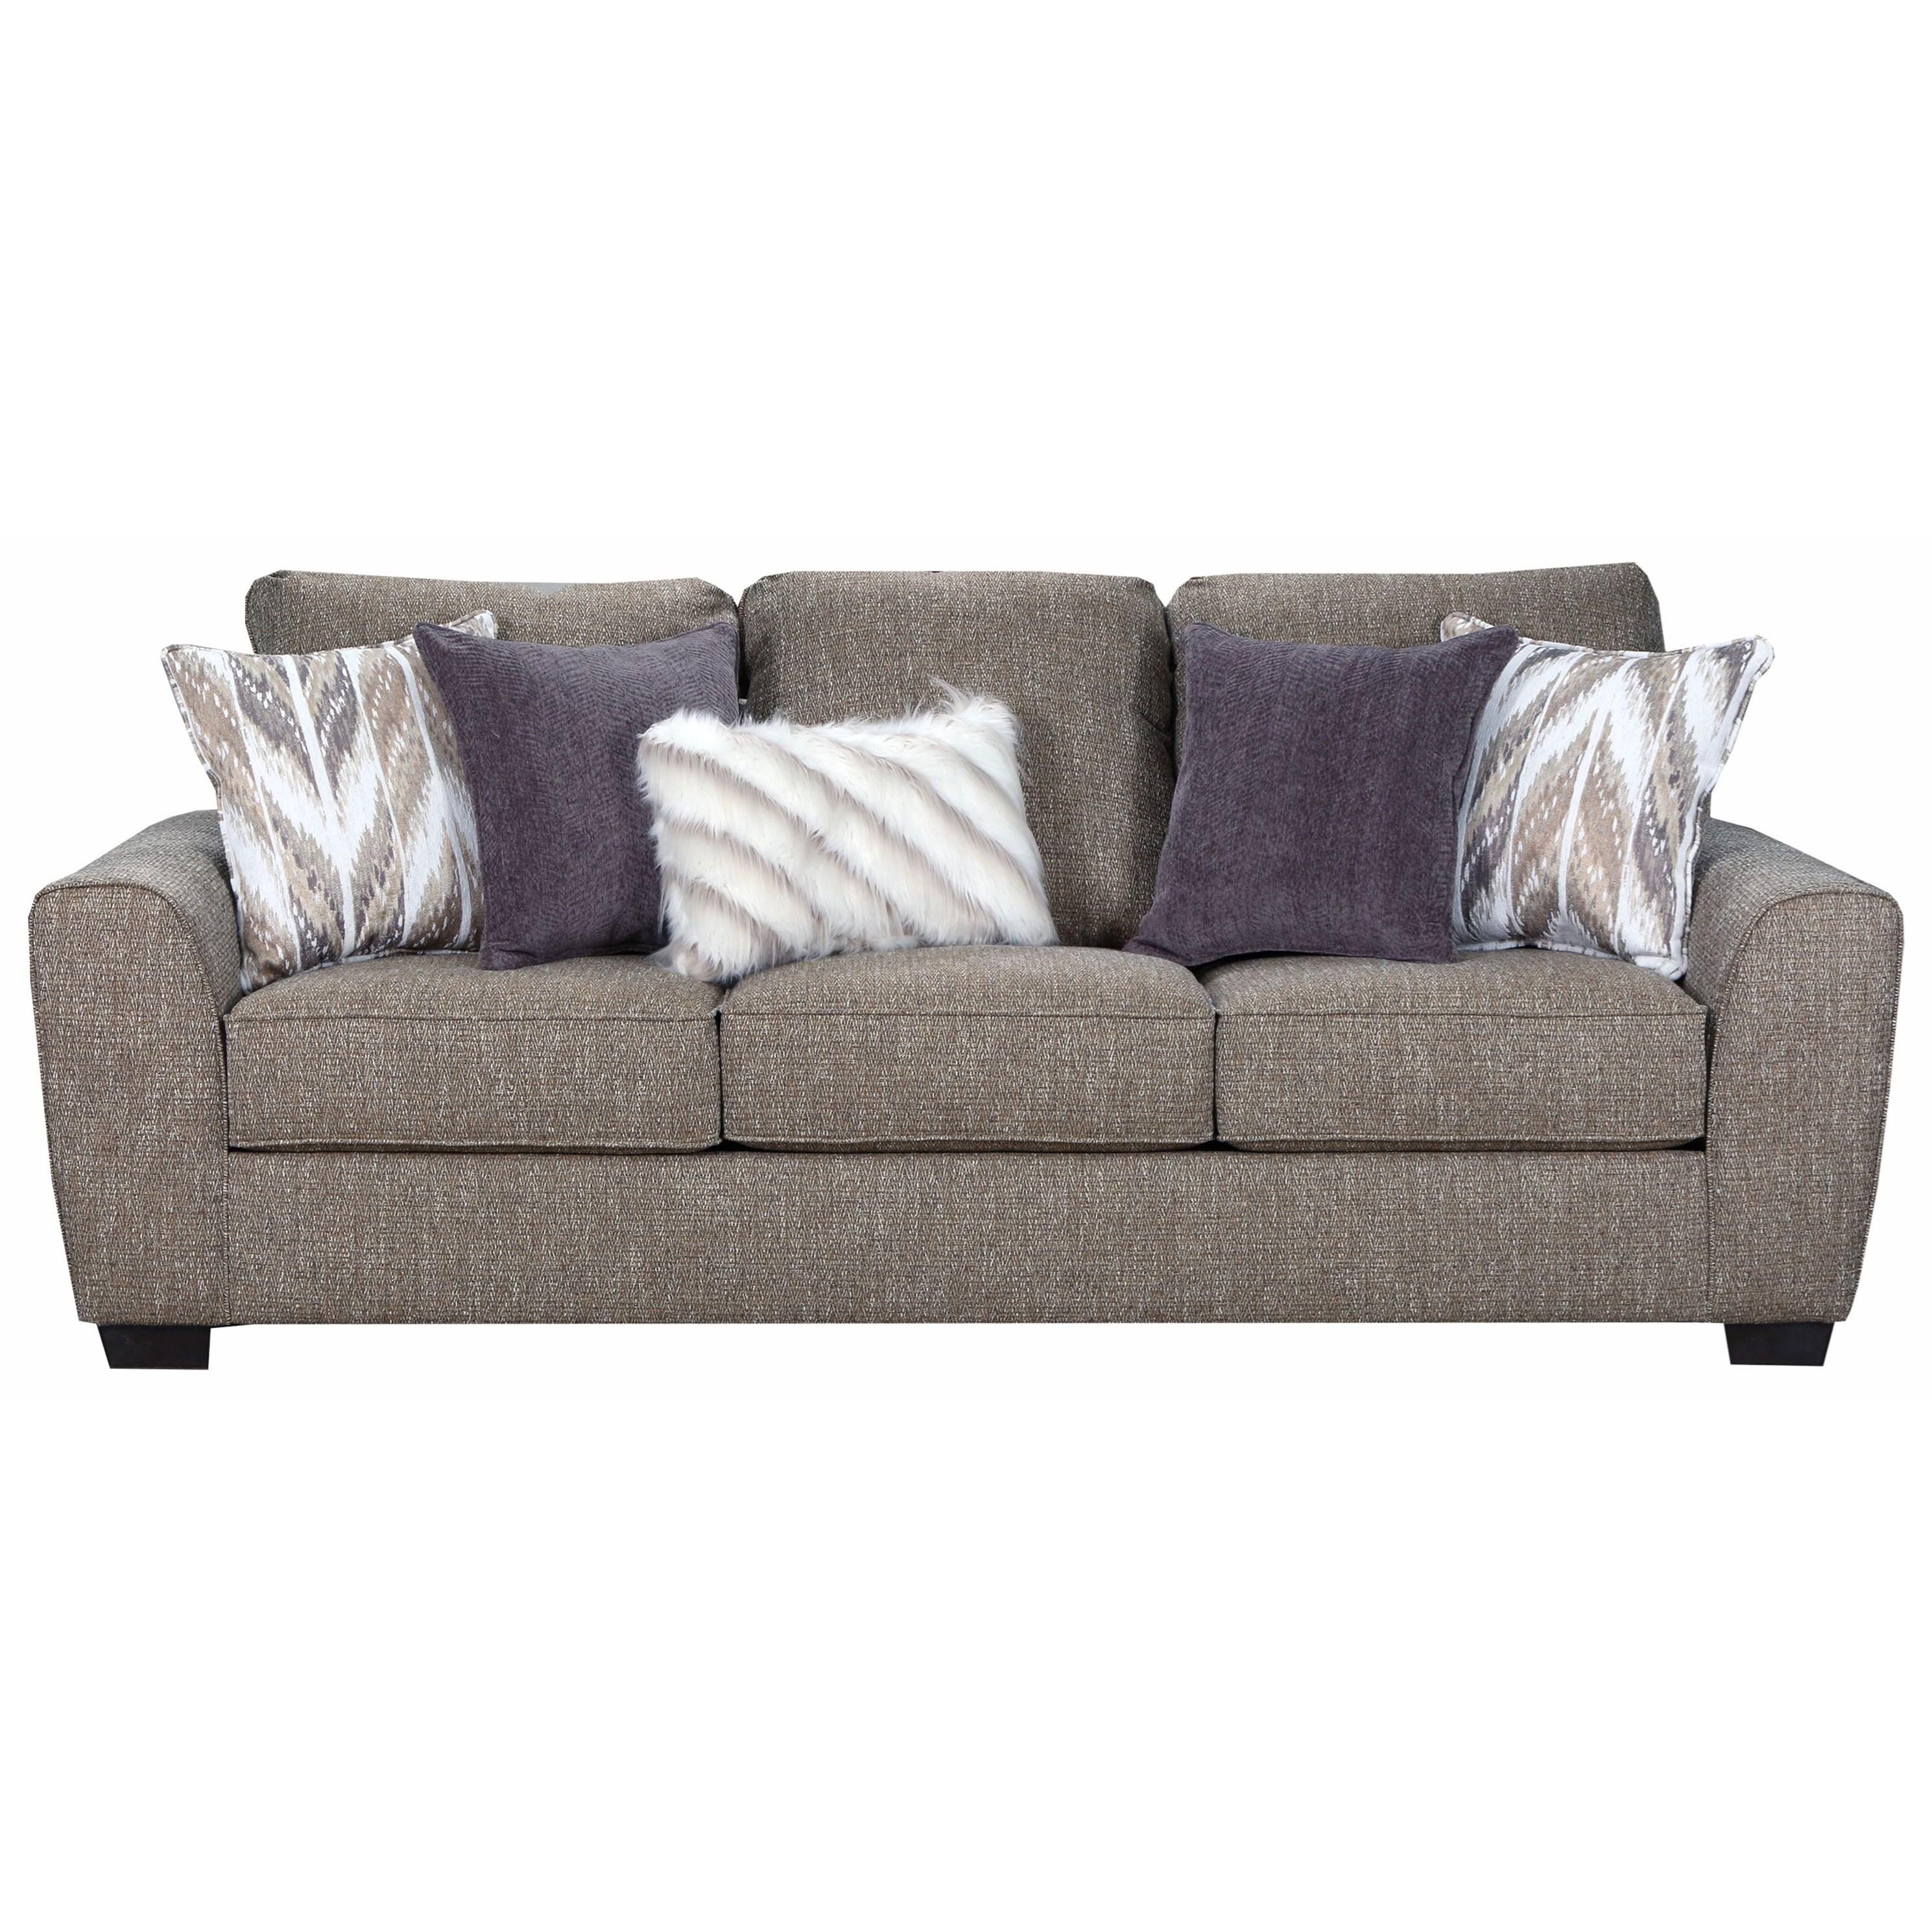 United Furniture Industries 9770BR Sofa - Item Number: 9770BRSofa-Paradise Sisal